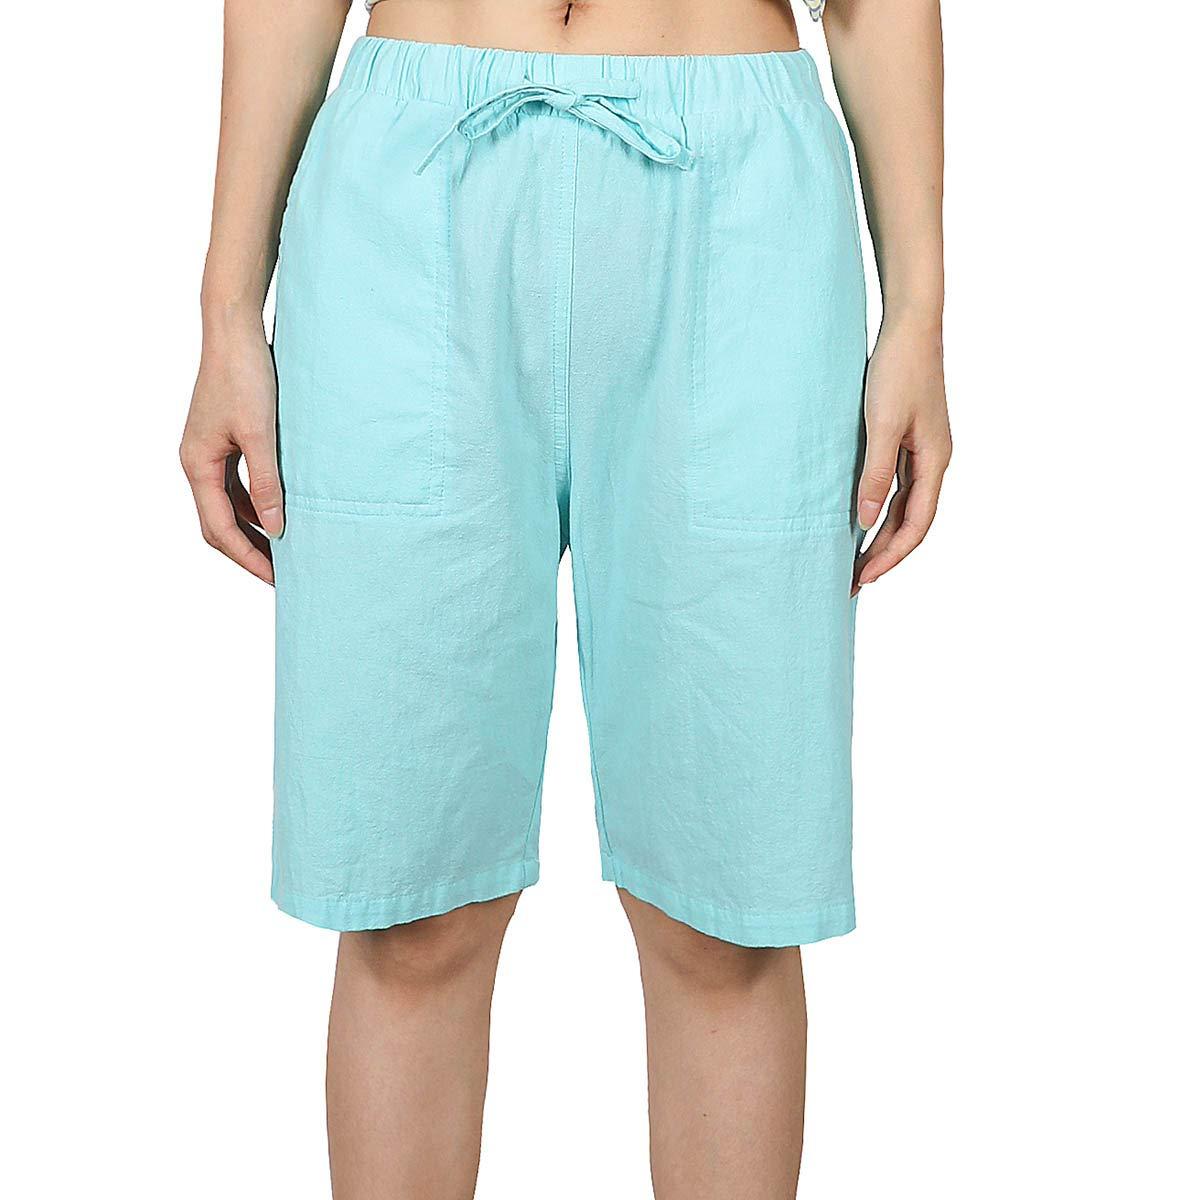 Summer Womens Shorts pockets shorts C1394 linen Casual Shorts yellow shorts Linen Drawstring  Shorts Elastic Waist Shorts Linen shorts